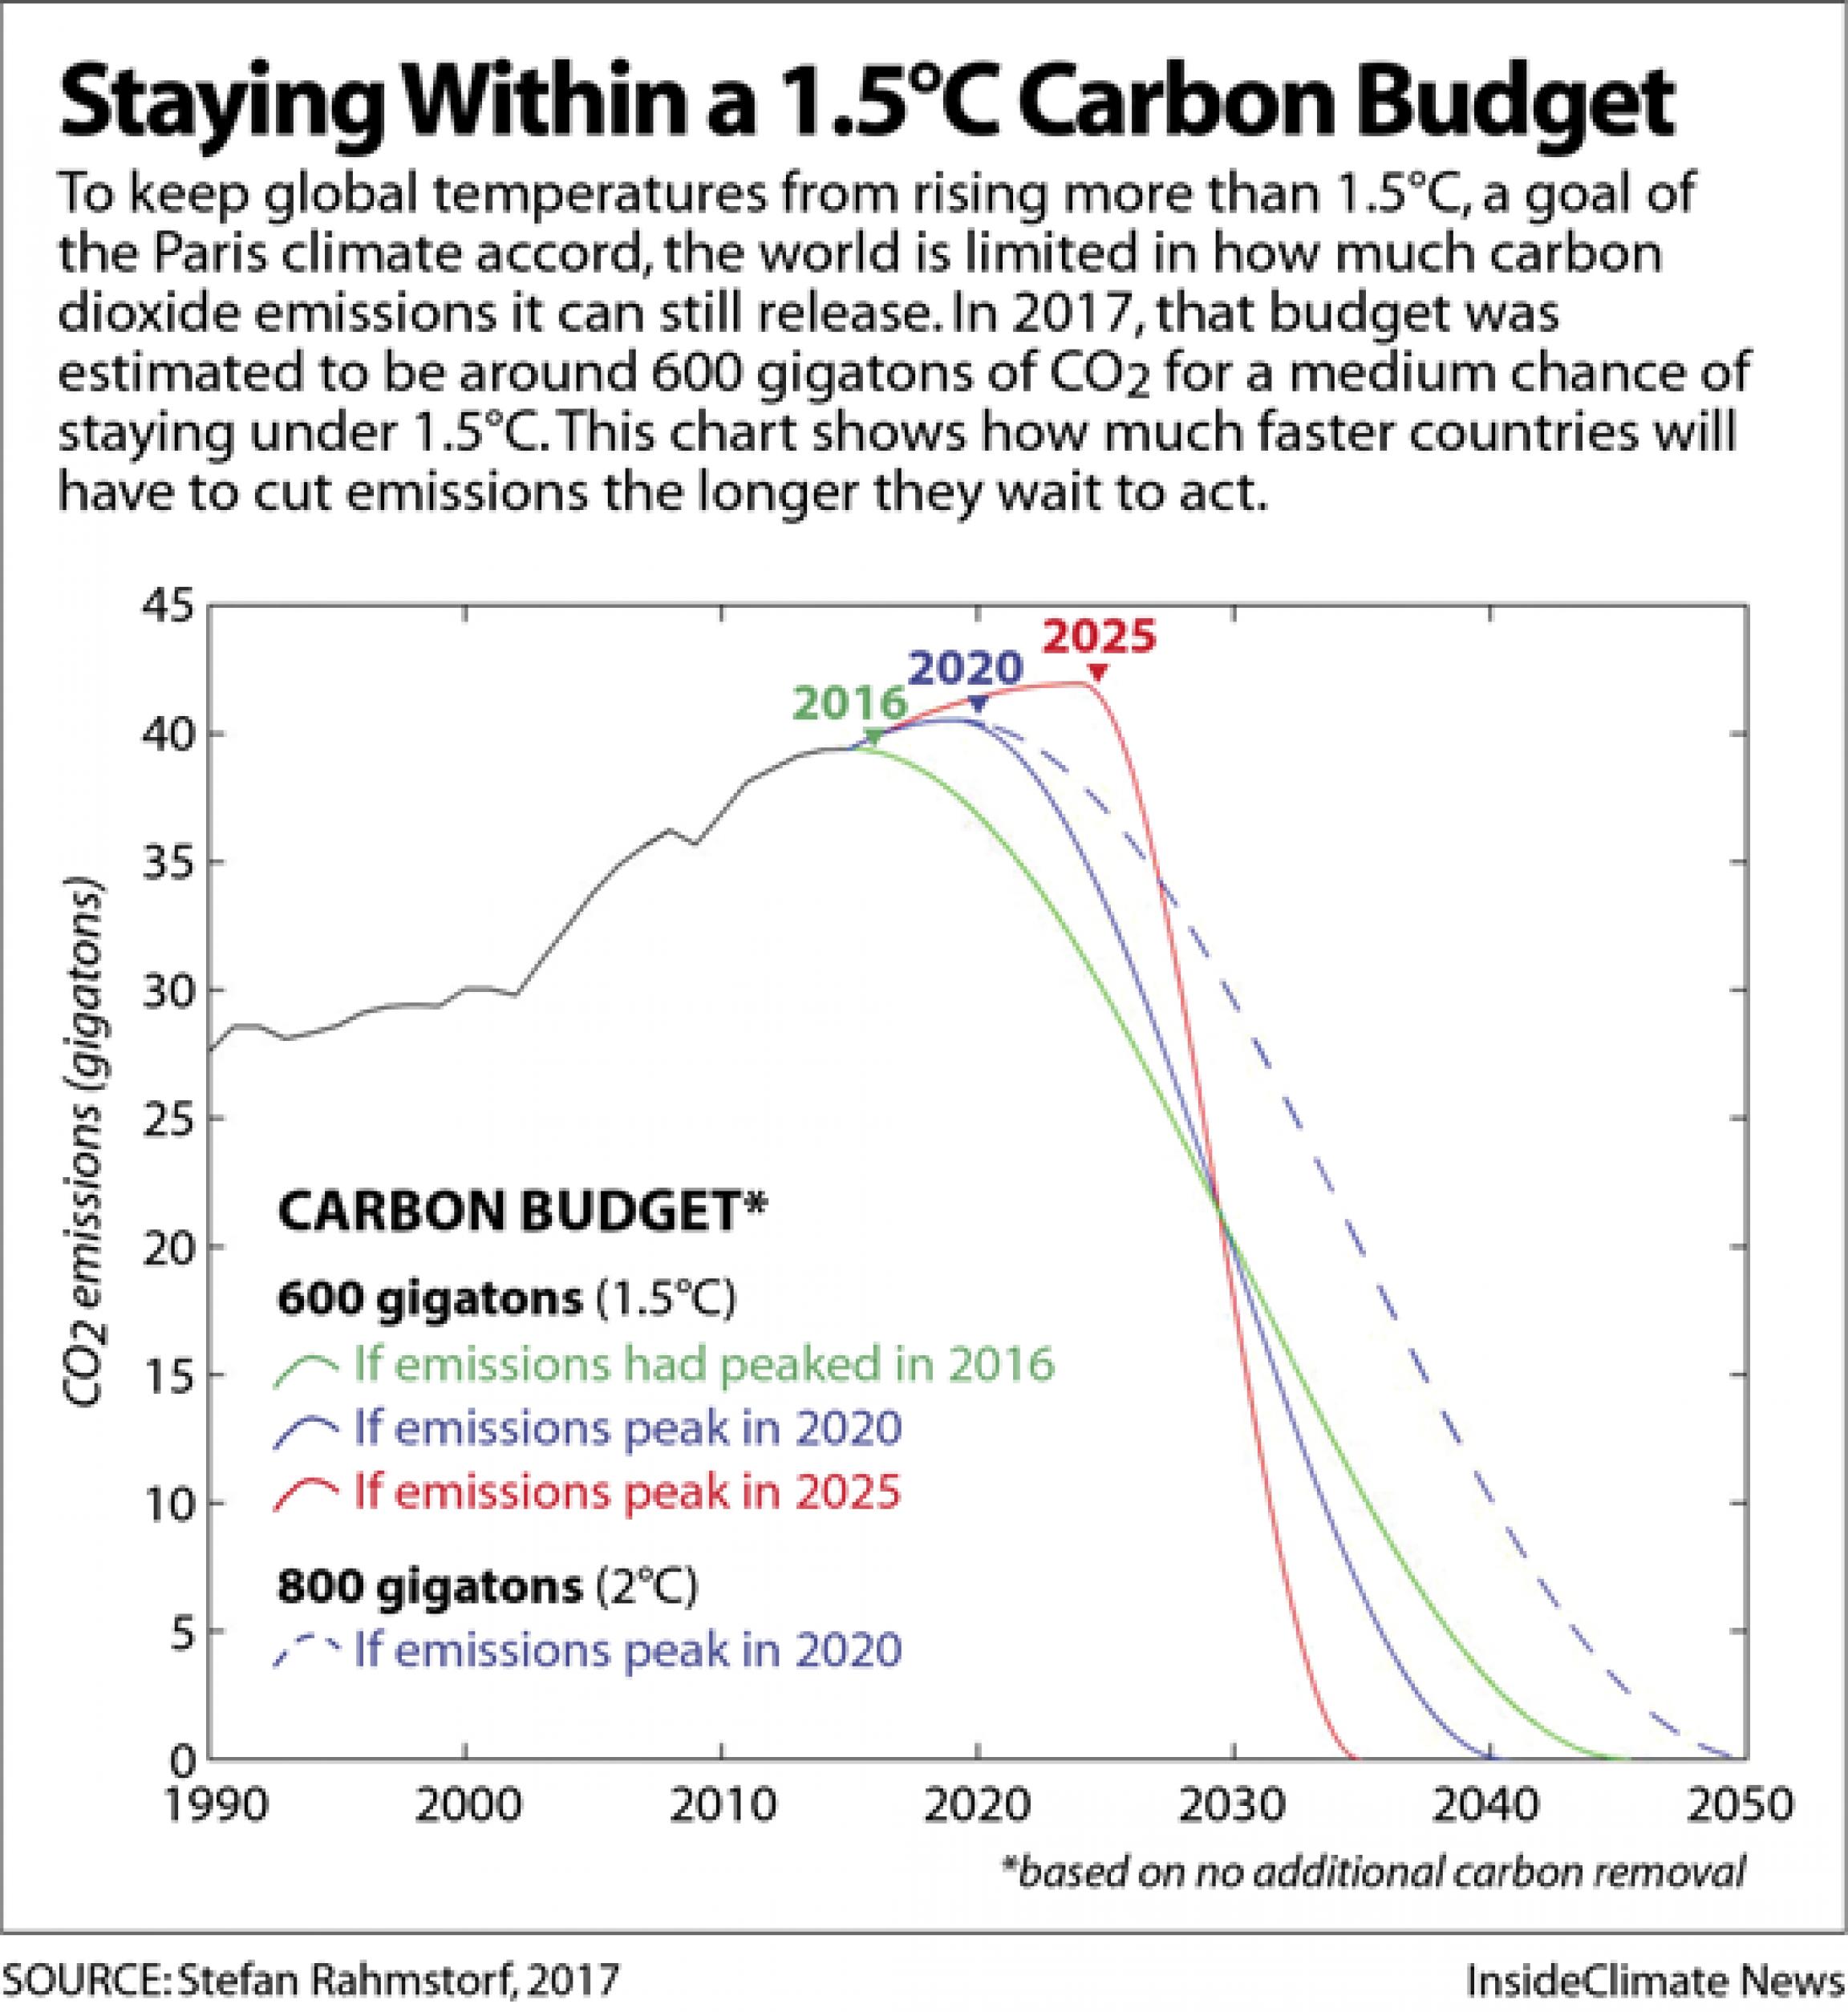 A graphic showin lines describing a carbon budget trend.